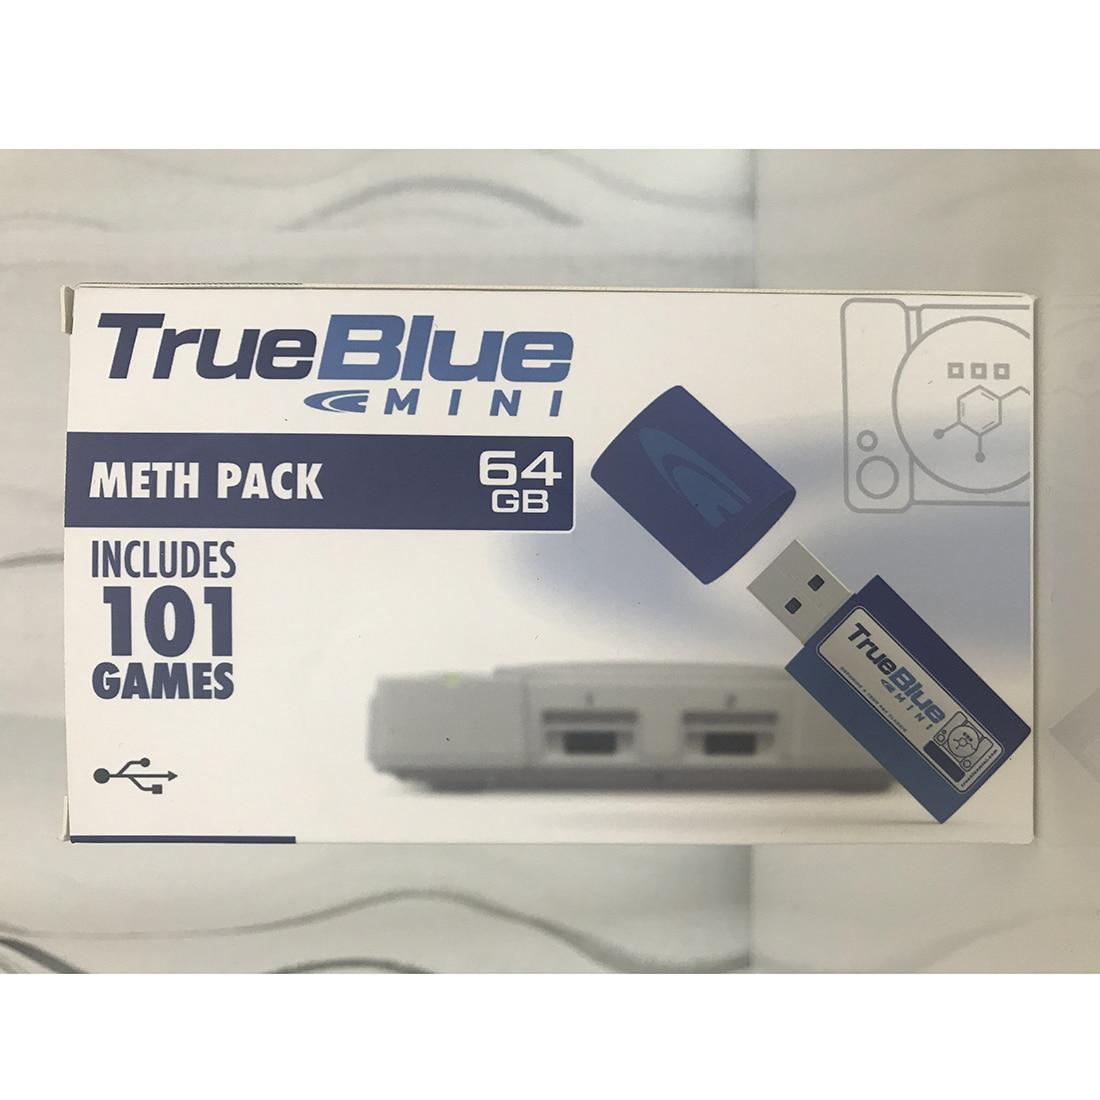 HOBBYINRC True Blue Mini 64G 101 Games Crackhead Pack +64G 101 Games Meth Pack for PlayStation Classic Games & Accessories